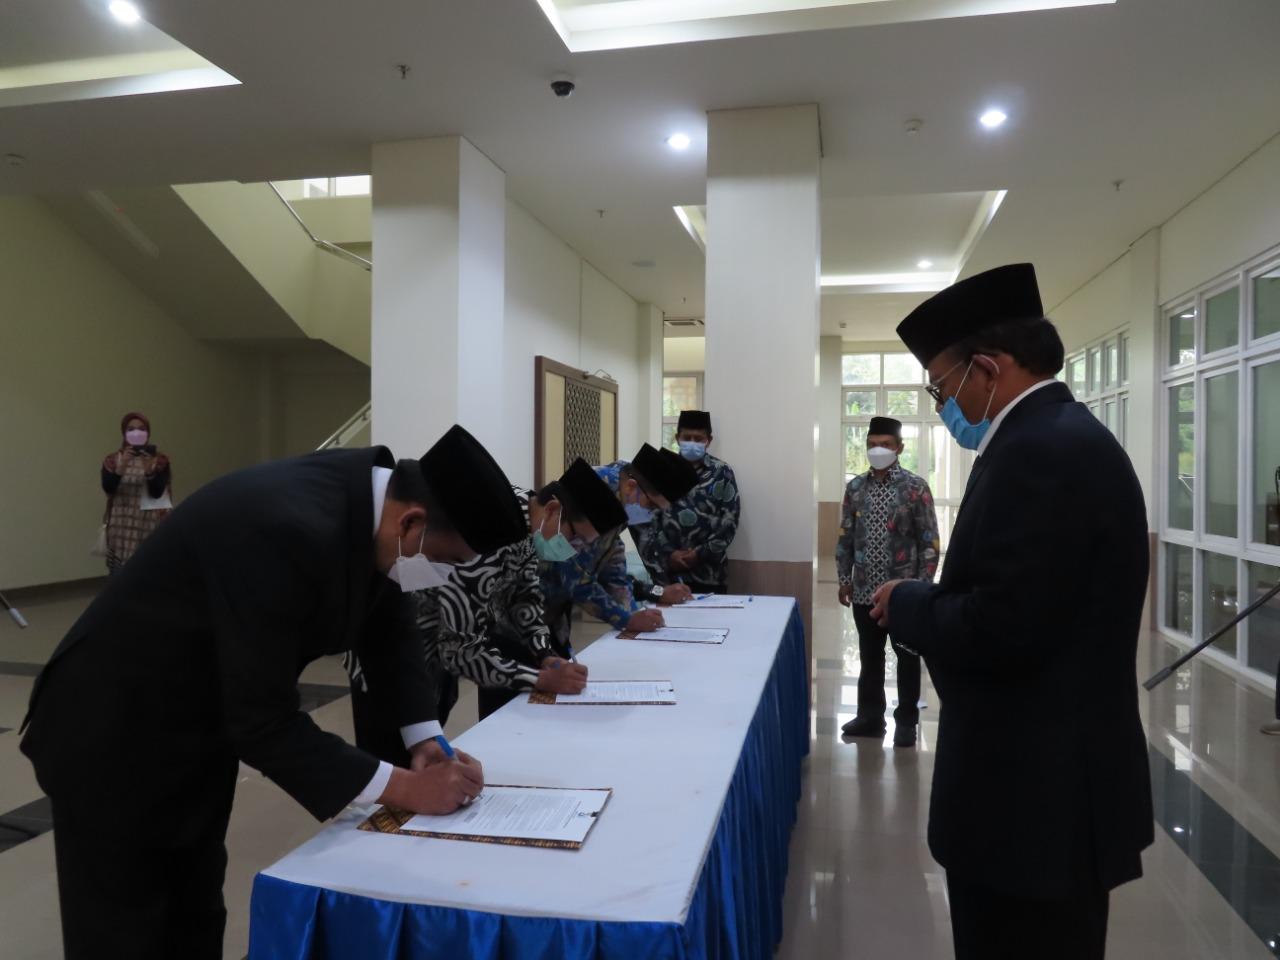 UIII Rector Prof. Komaruddin Hidayat Inaugurated Vice Rector, Deans, and UIII Officials